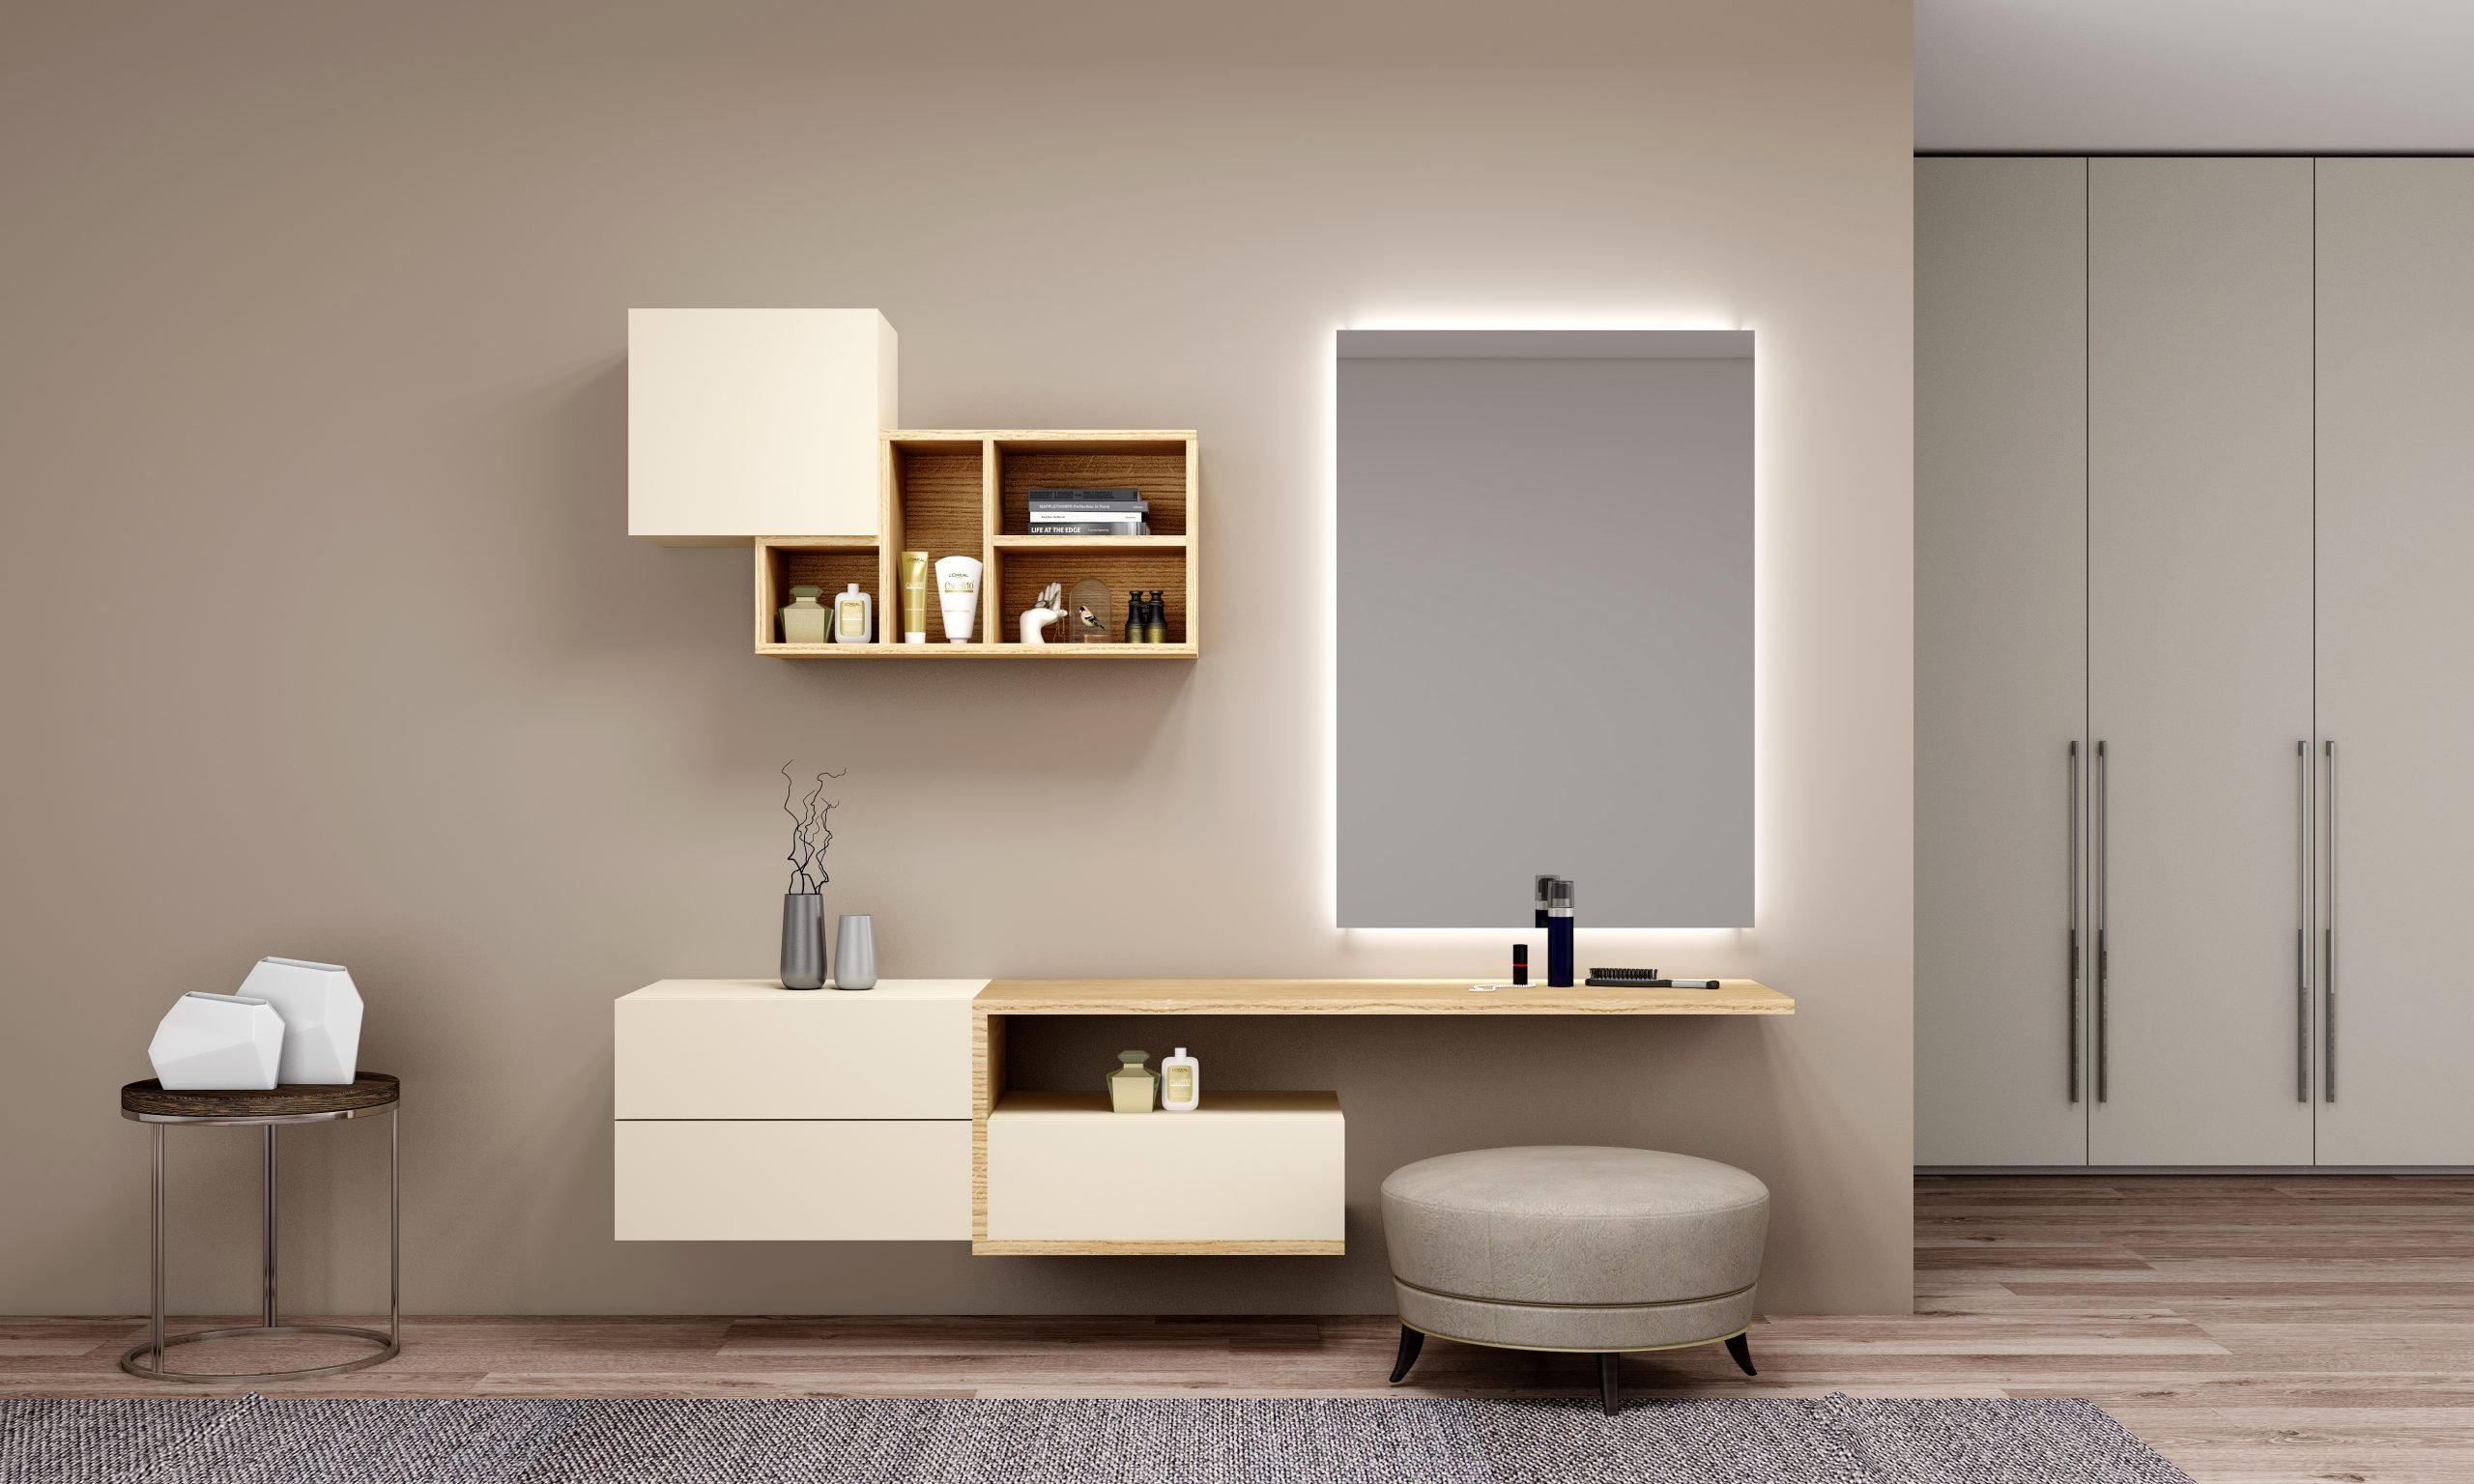 Bespoke dressing table with custom Storage in Creama beige finish